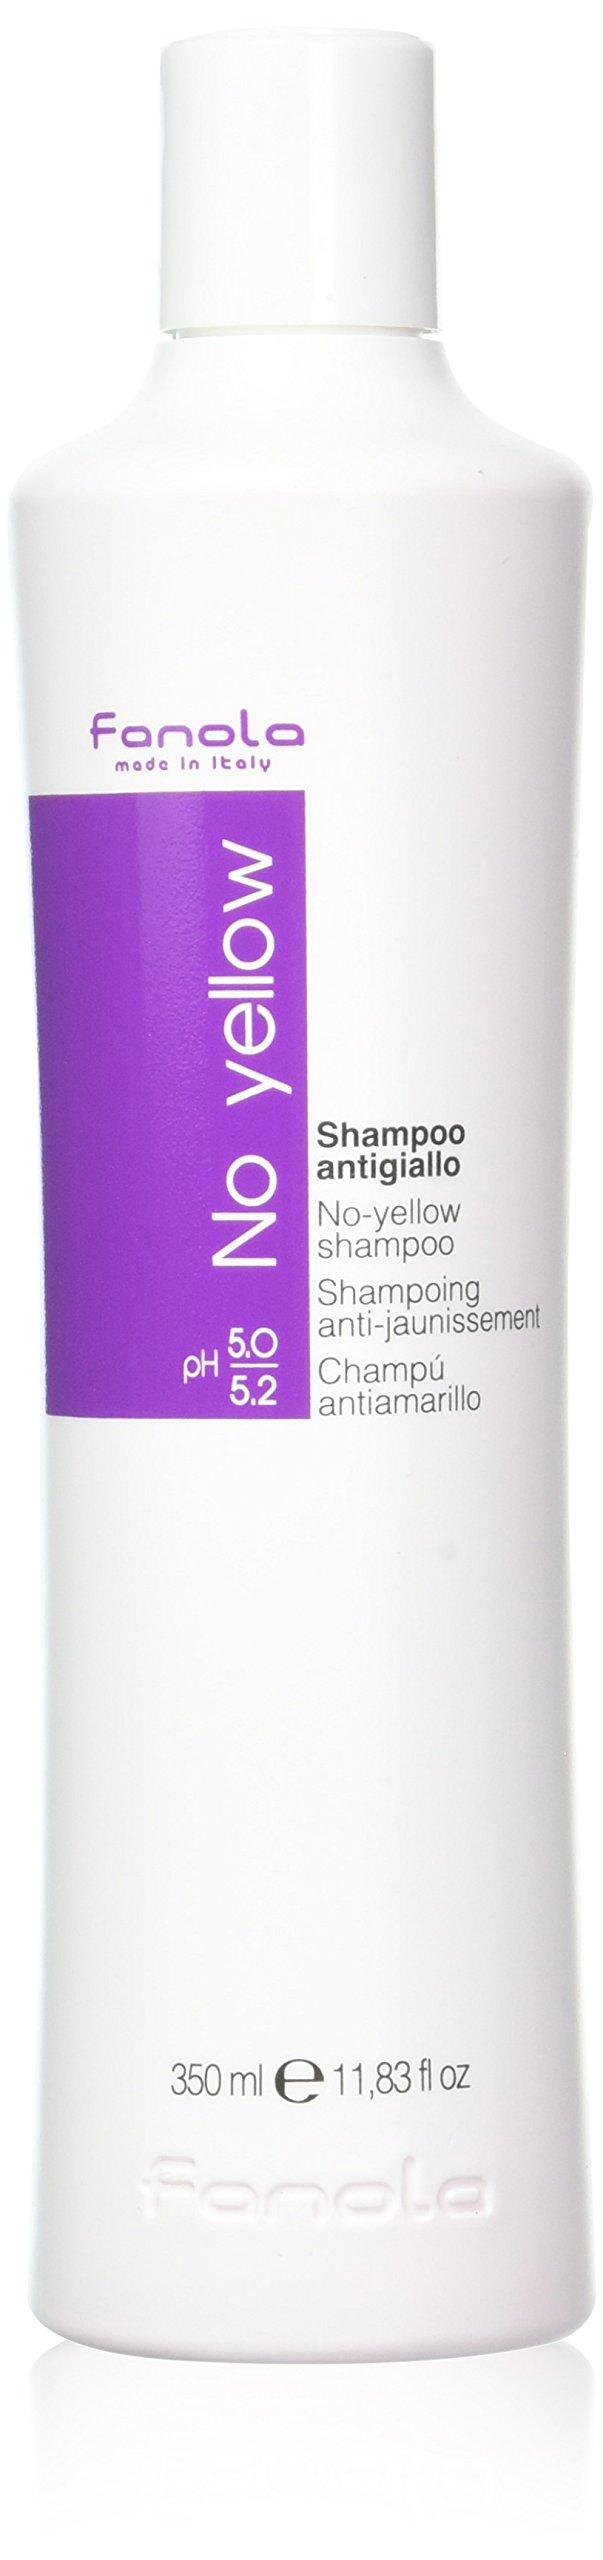 Fanola Champú NO YELLOW Antiamarillo - Especial cabellos grises, aclarados, decolorados, mechas,